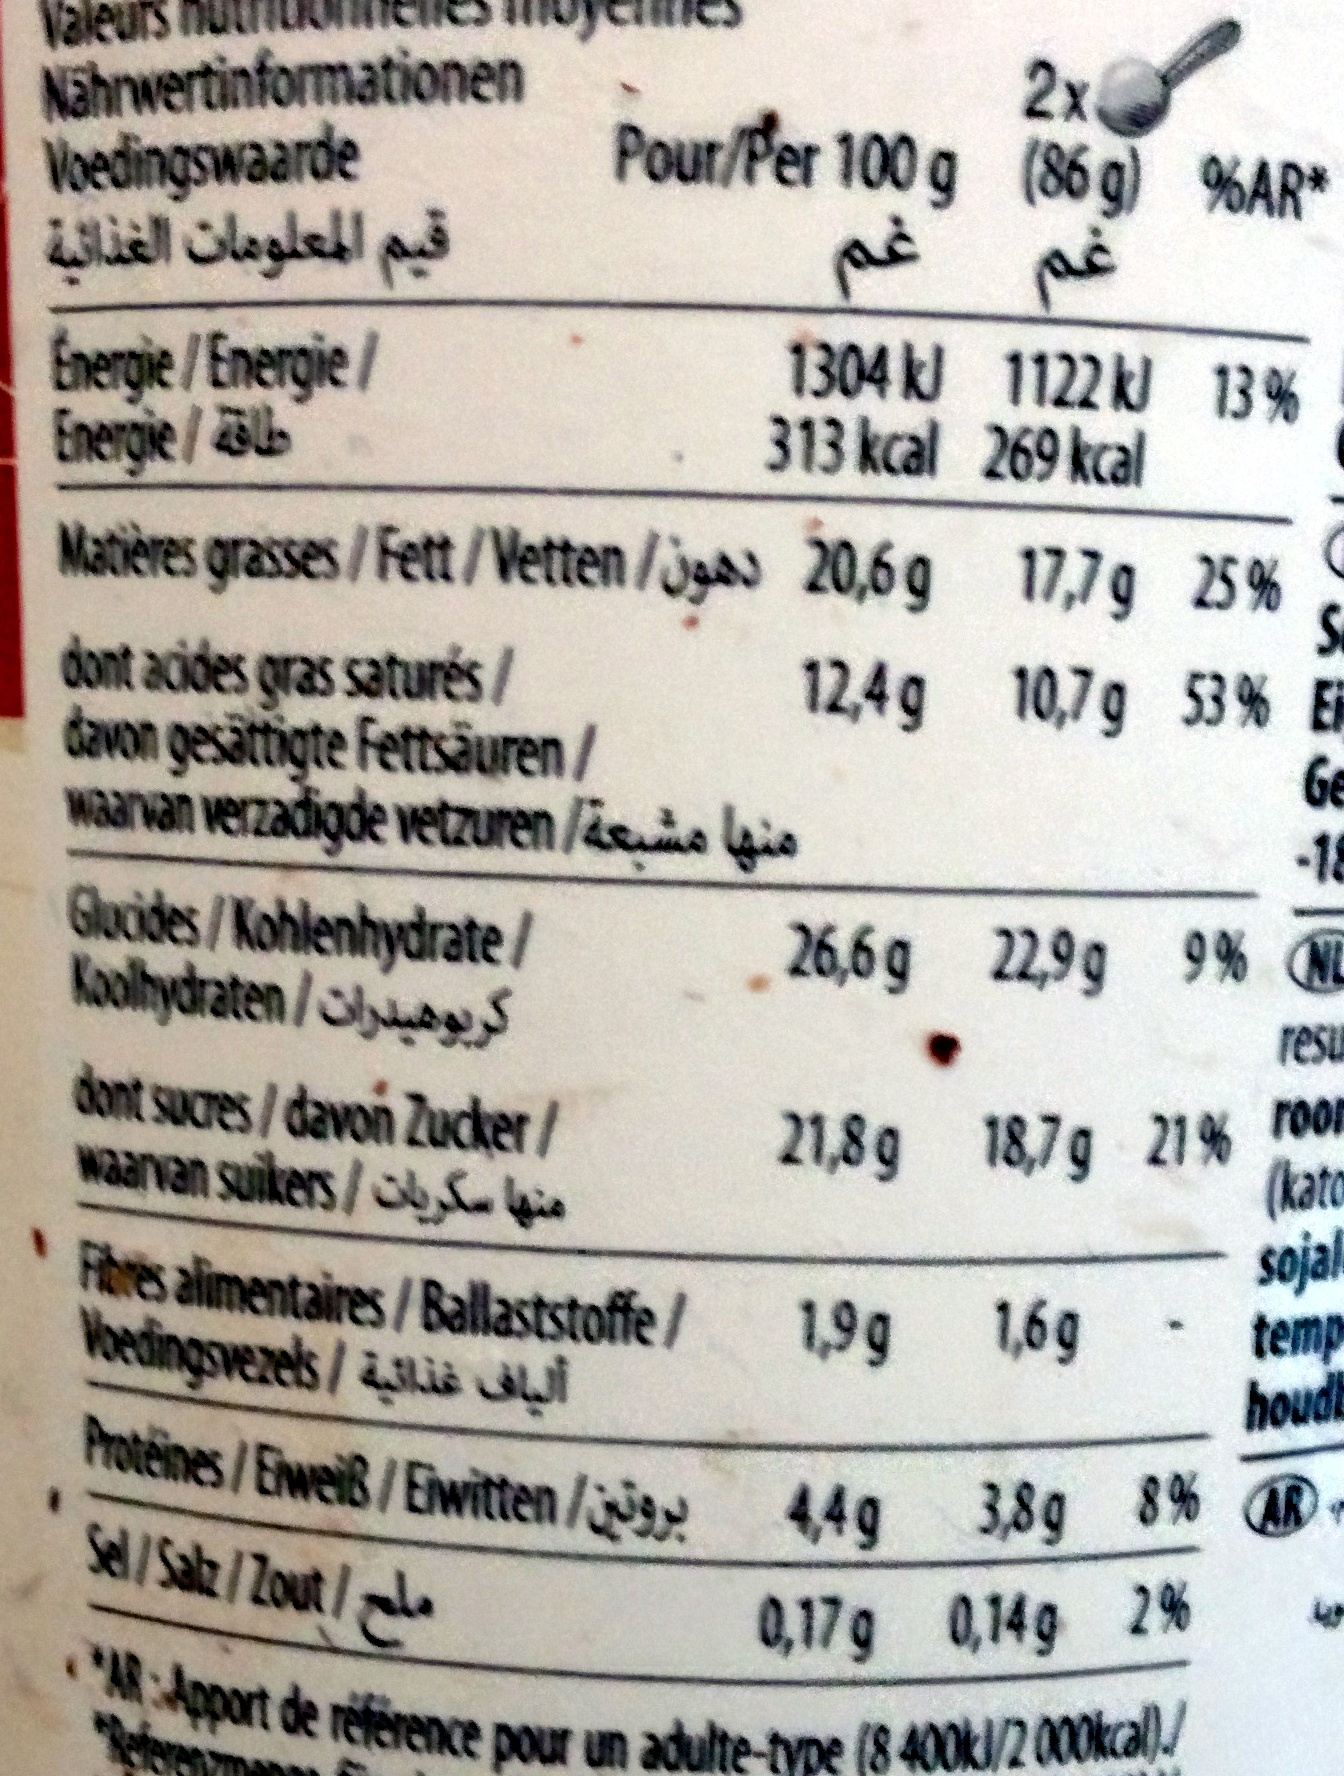 Belgian Chocolate Ice Cream Calories